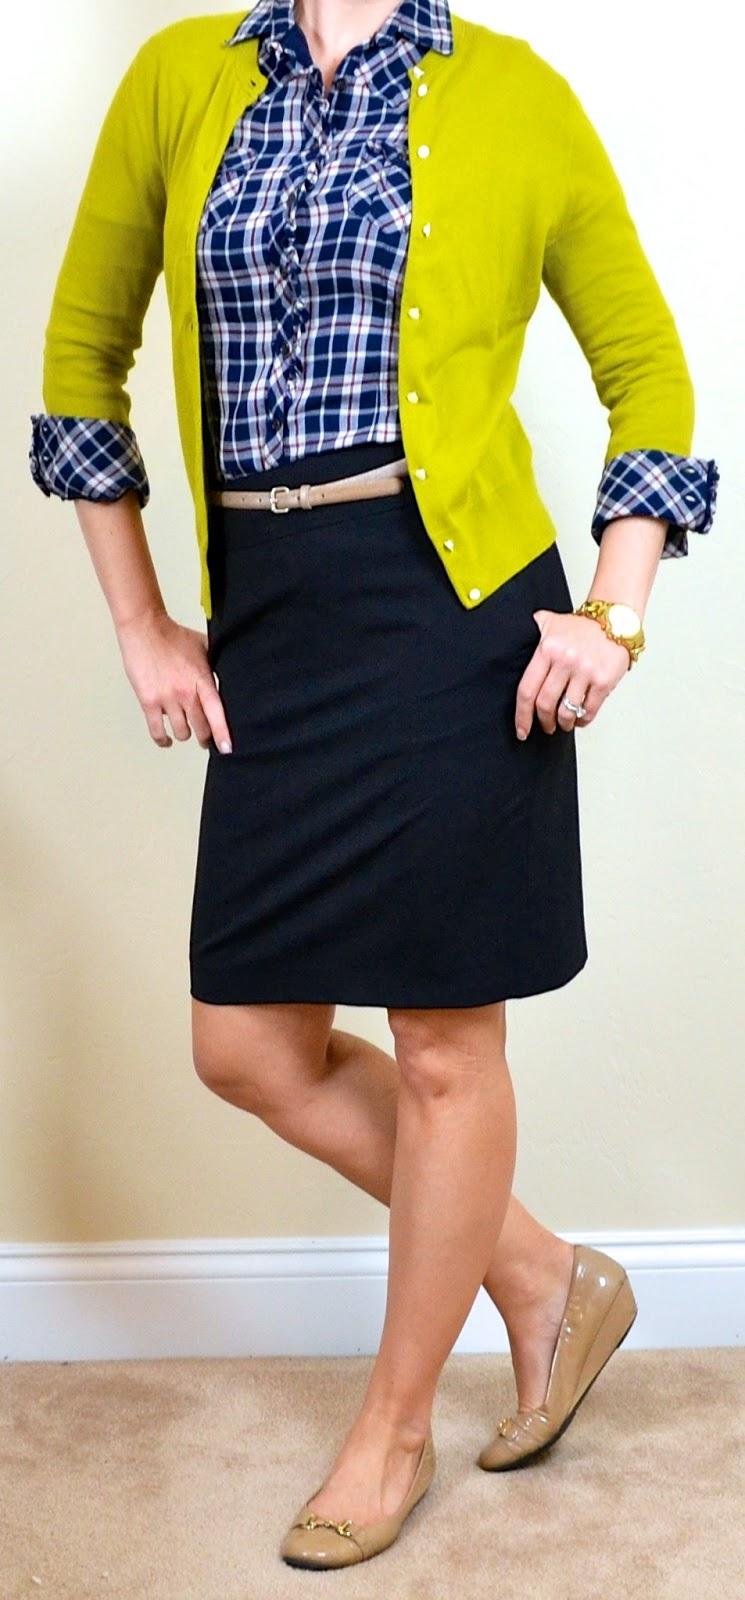 Outfit post blue plaid shirt mustard green cardigan black pencil skirt